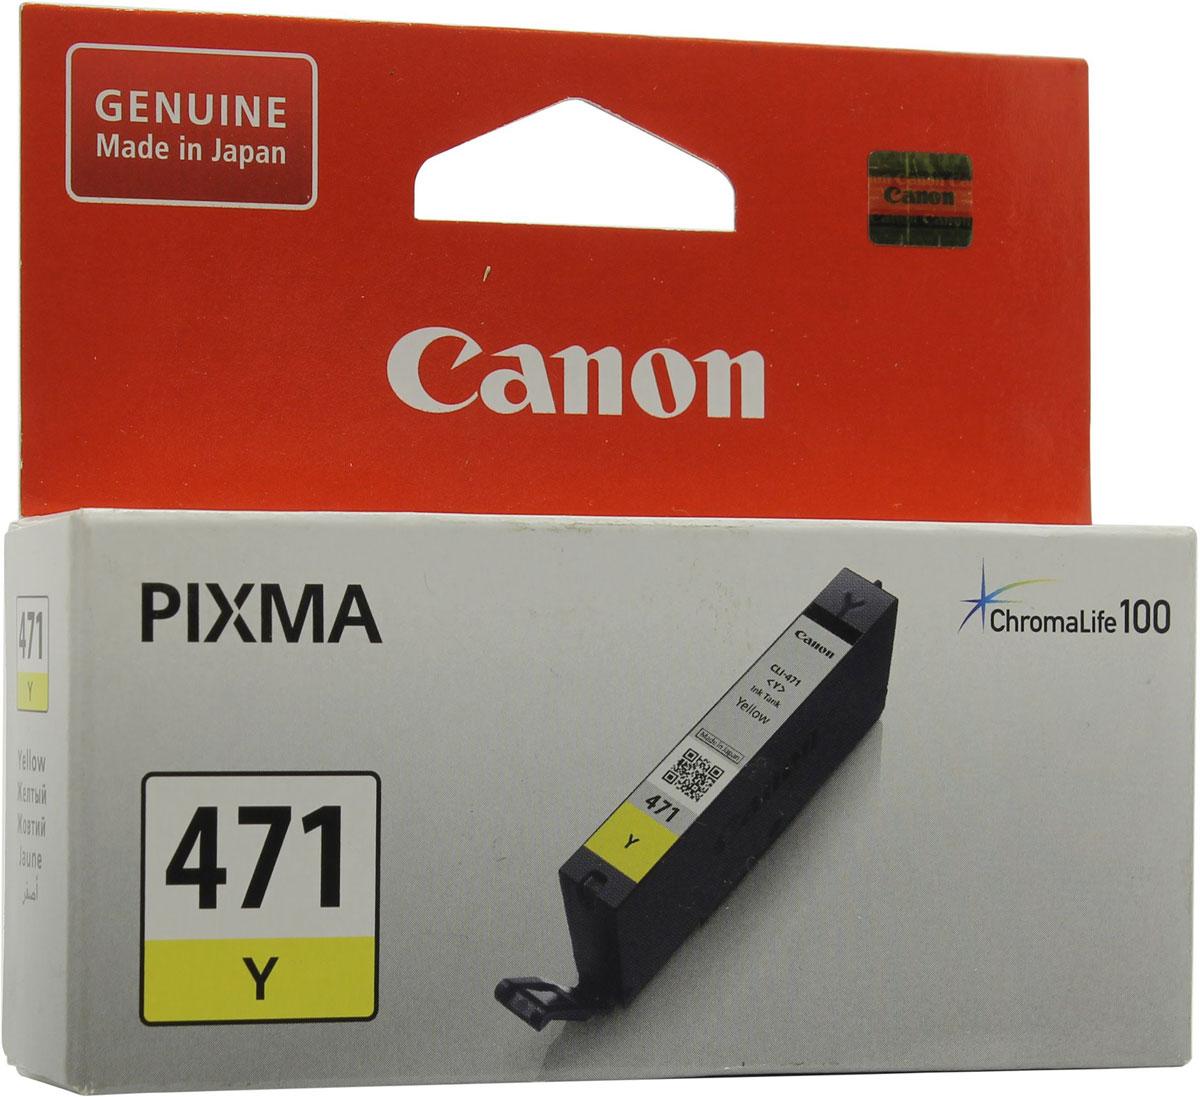 Canon CLI-471, Yellow картридж для Pixma MG5740/6840/7740 картридж для принтера colouring cg cli 426c cyan